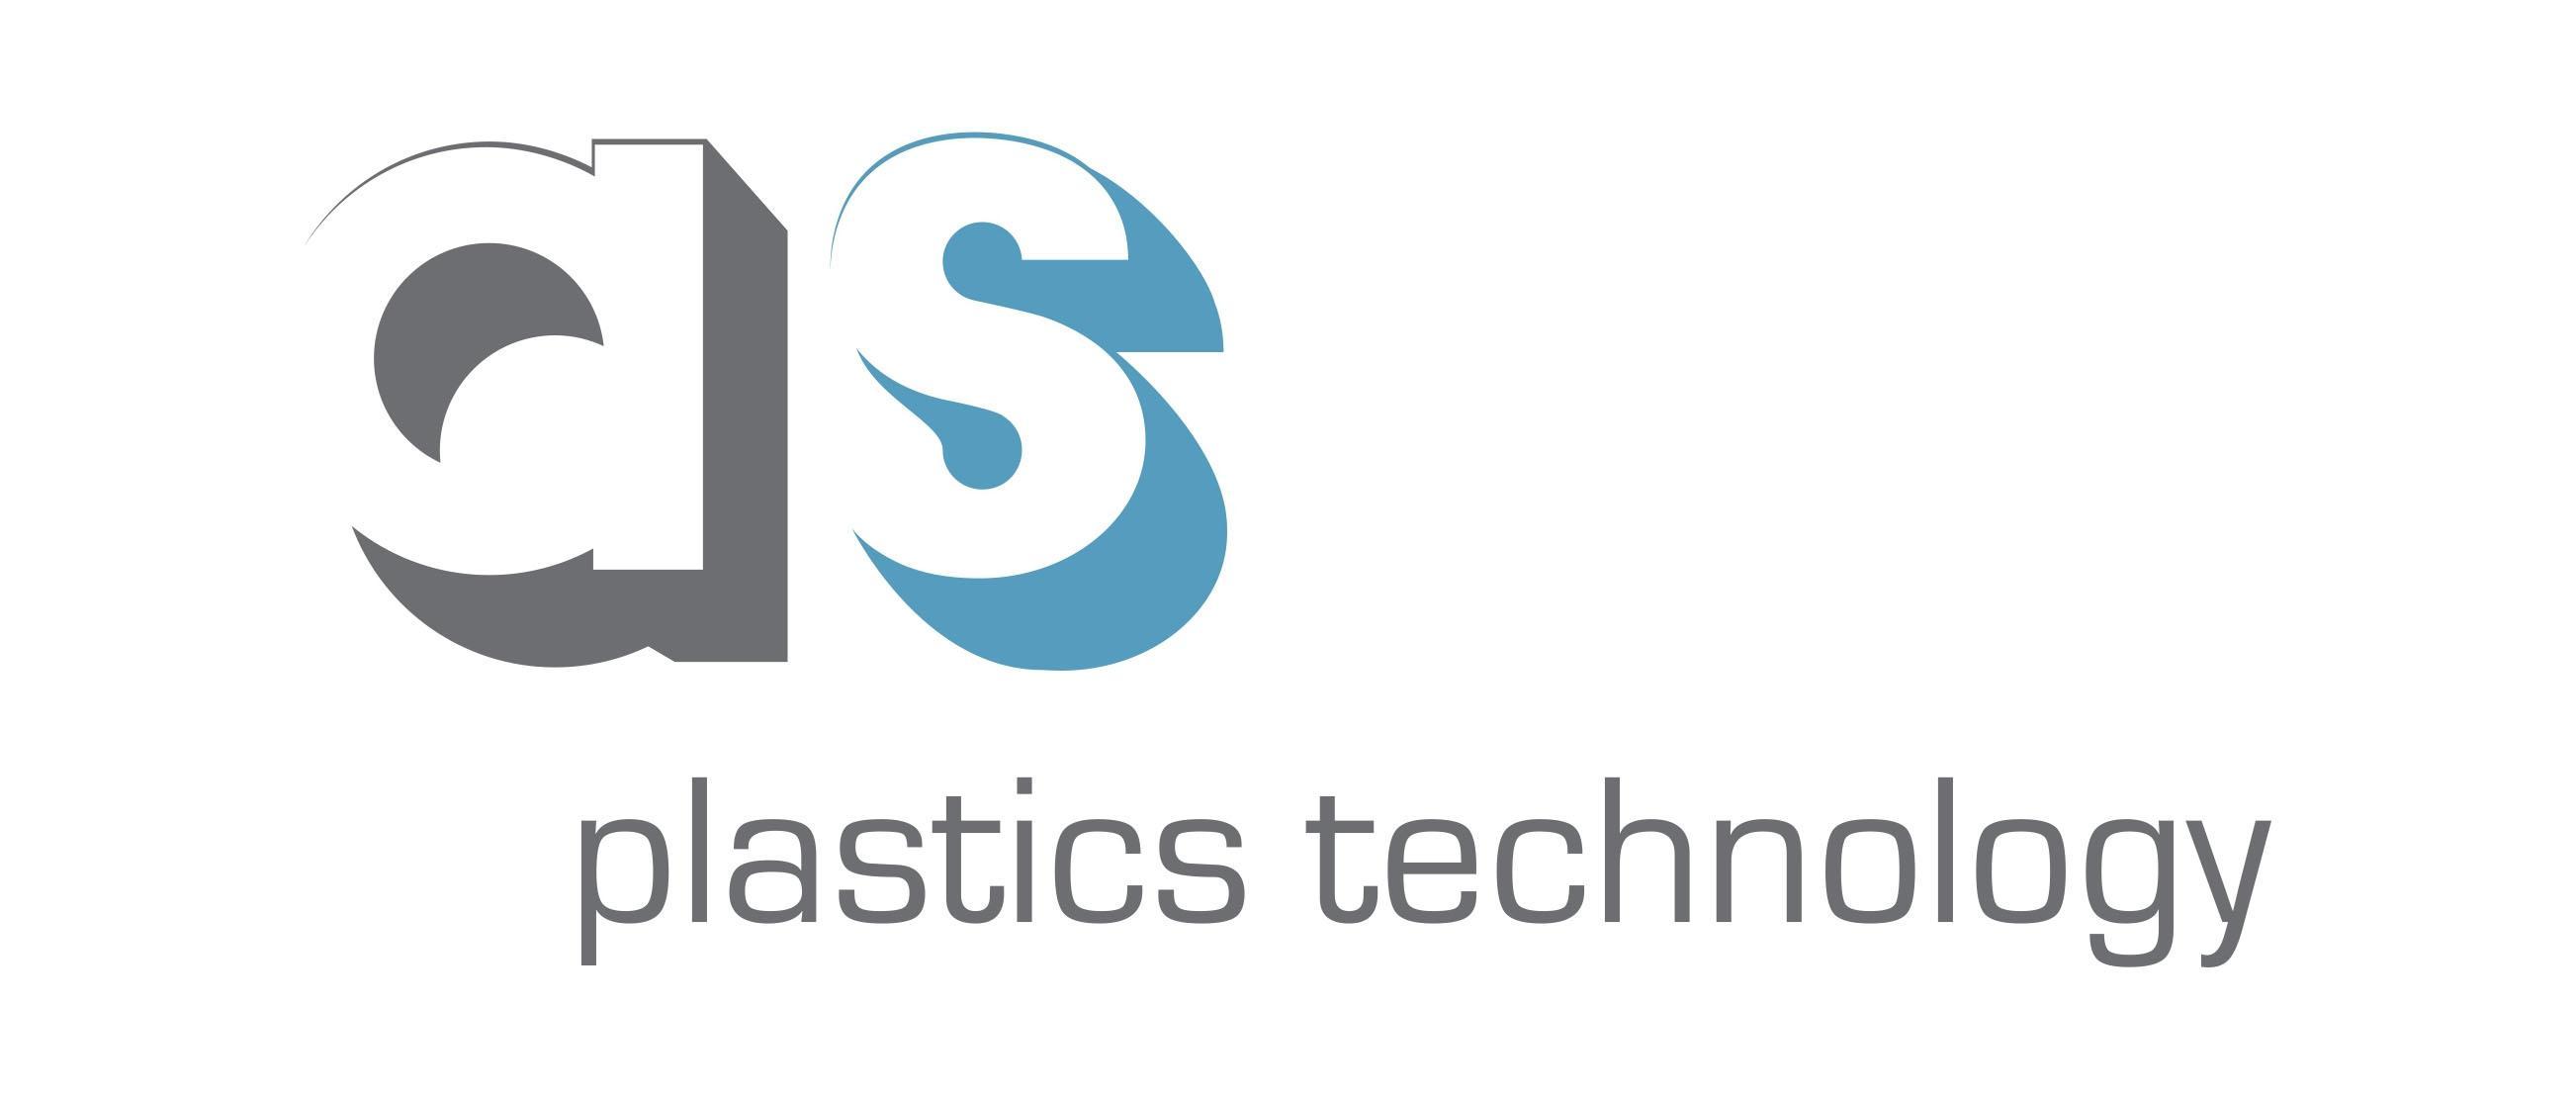 Logo AS plastics technology